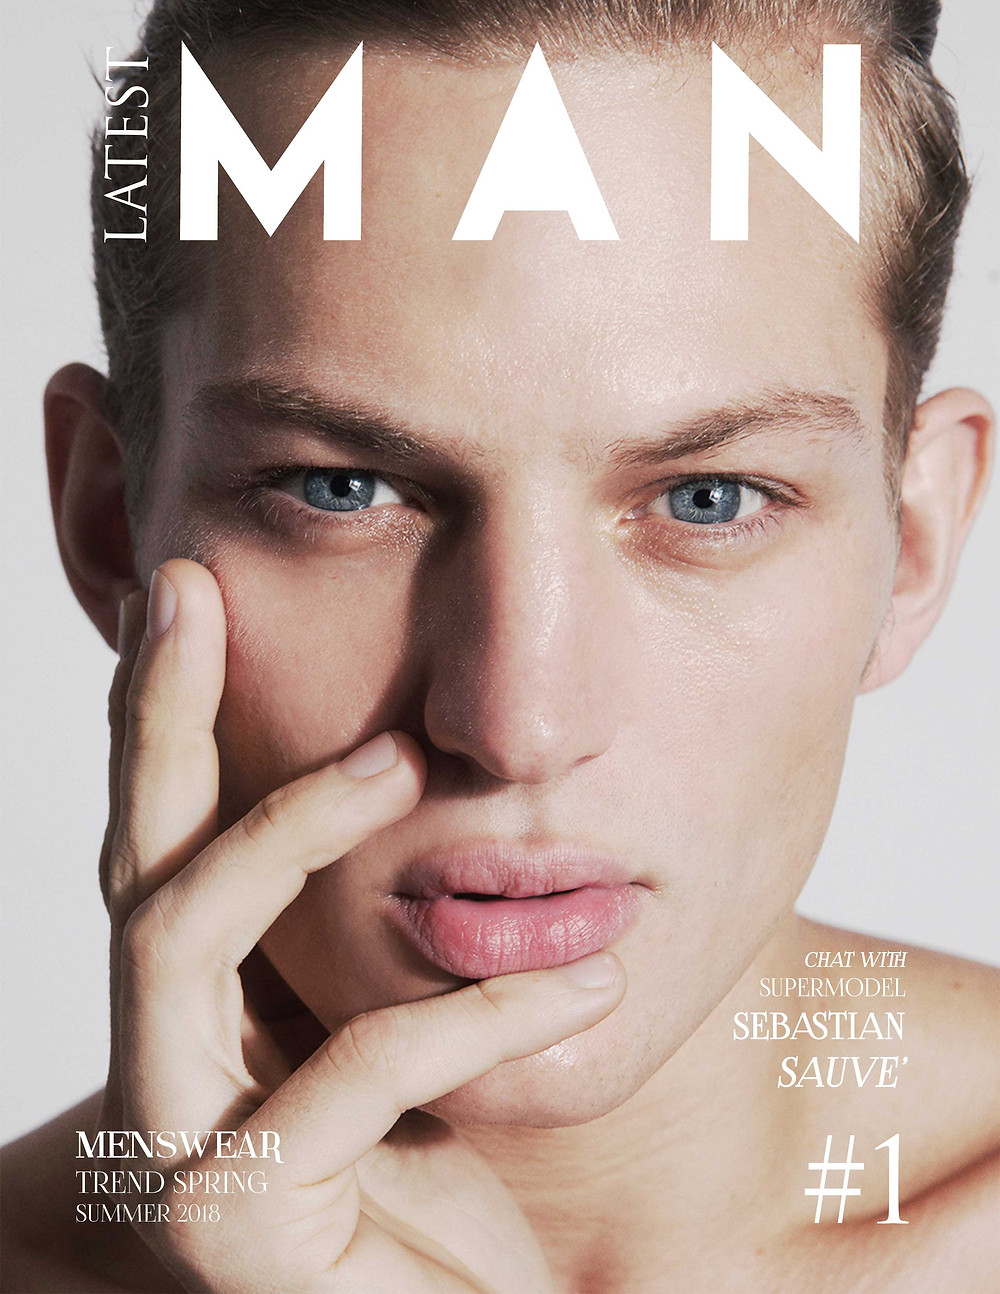 Sebastian Sauvé cover Latest magazine